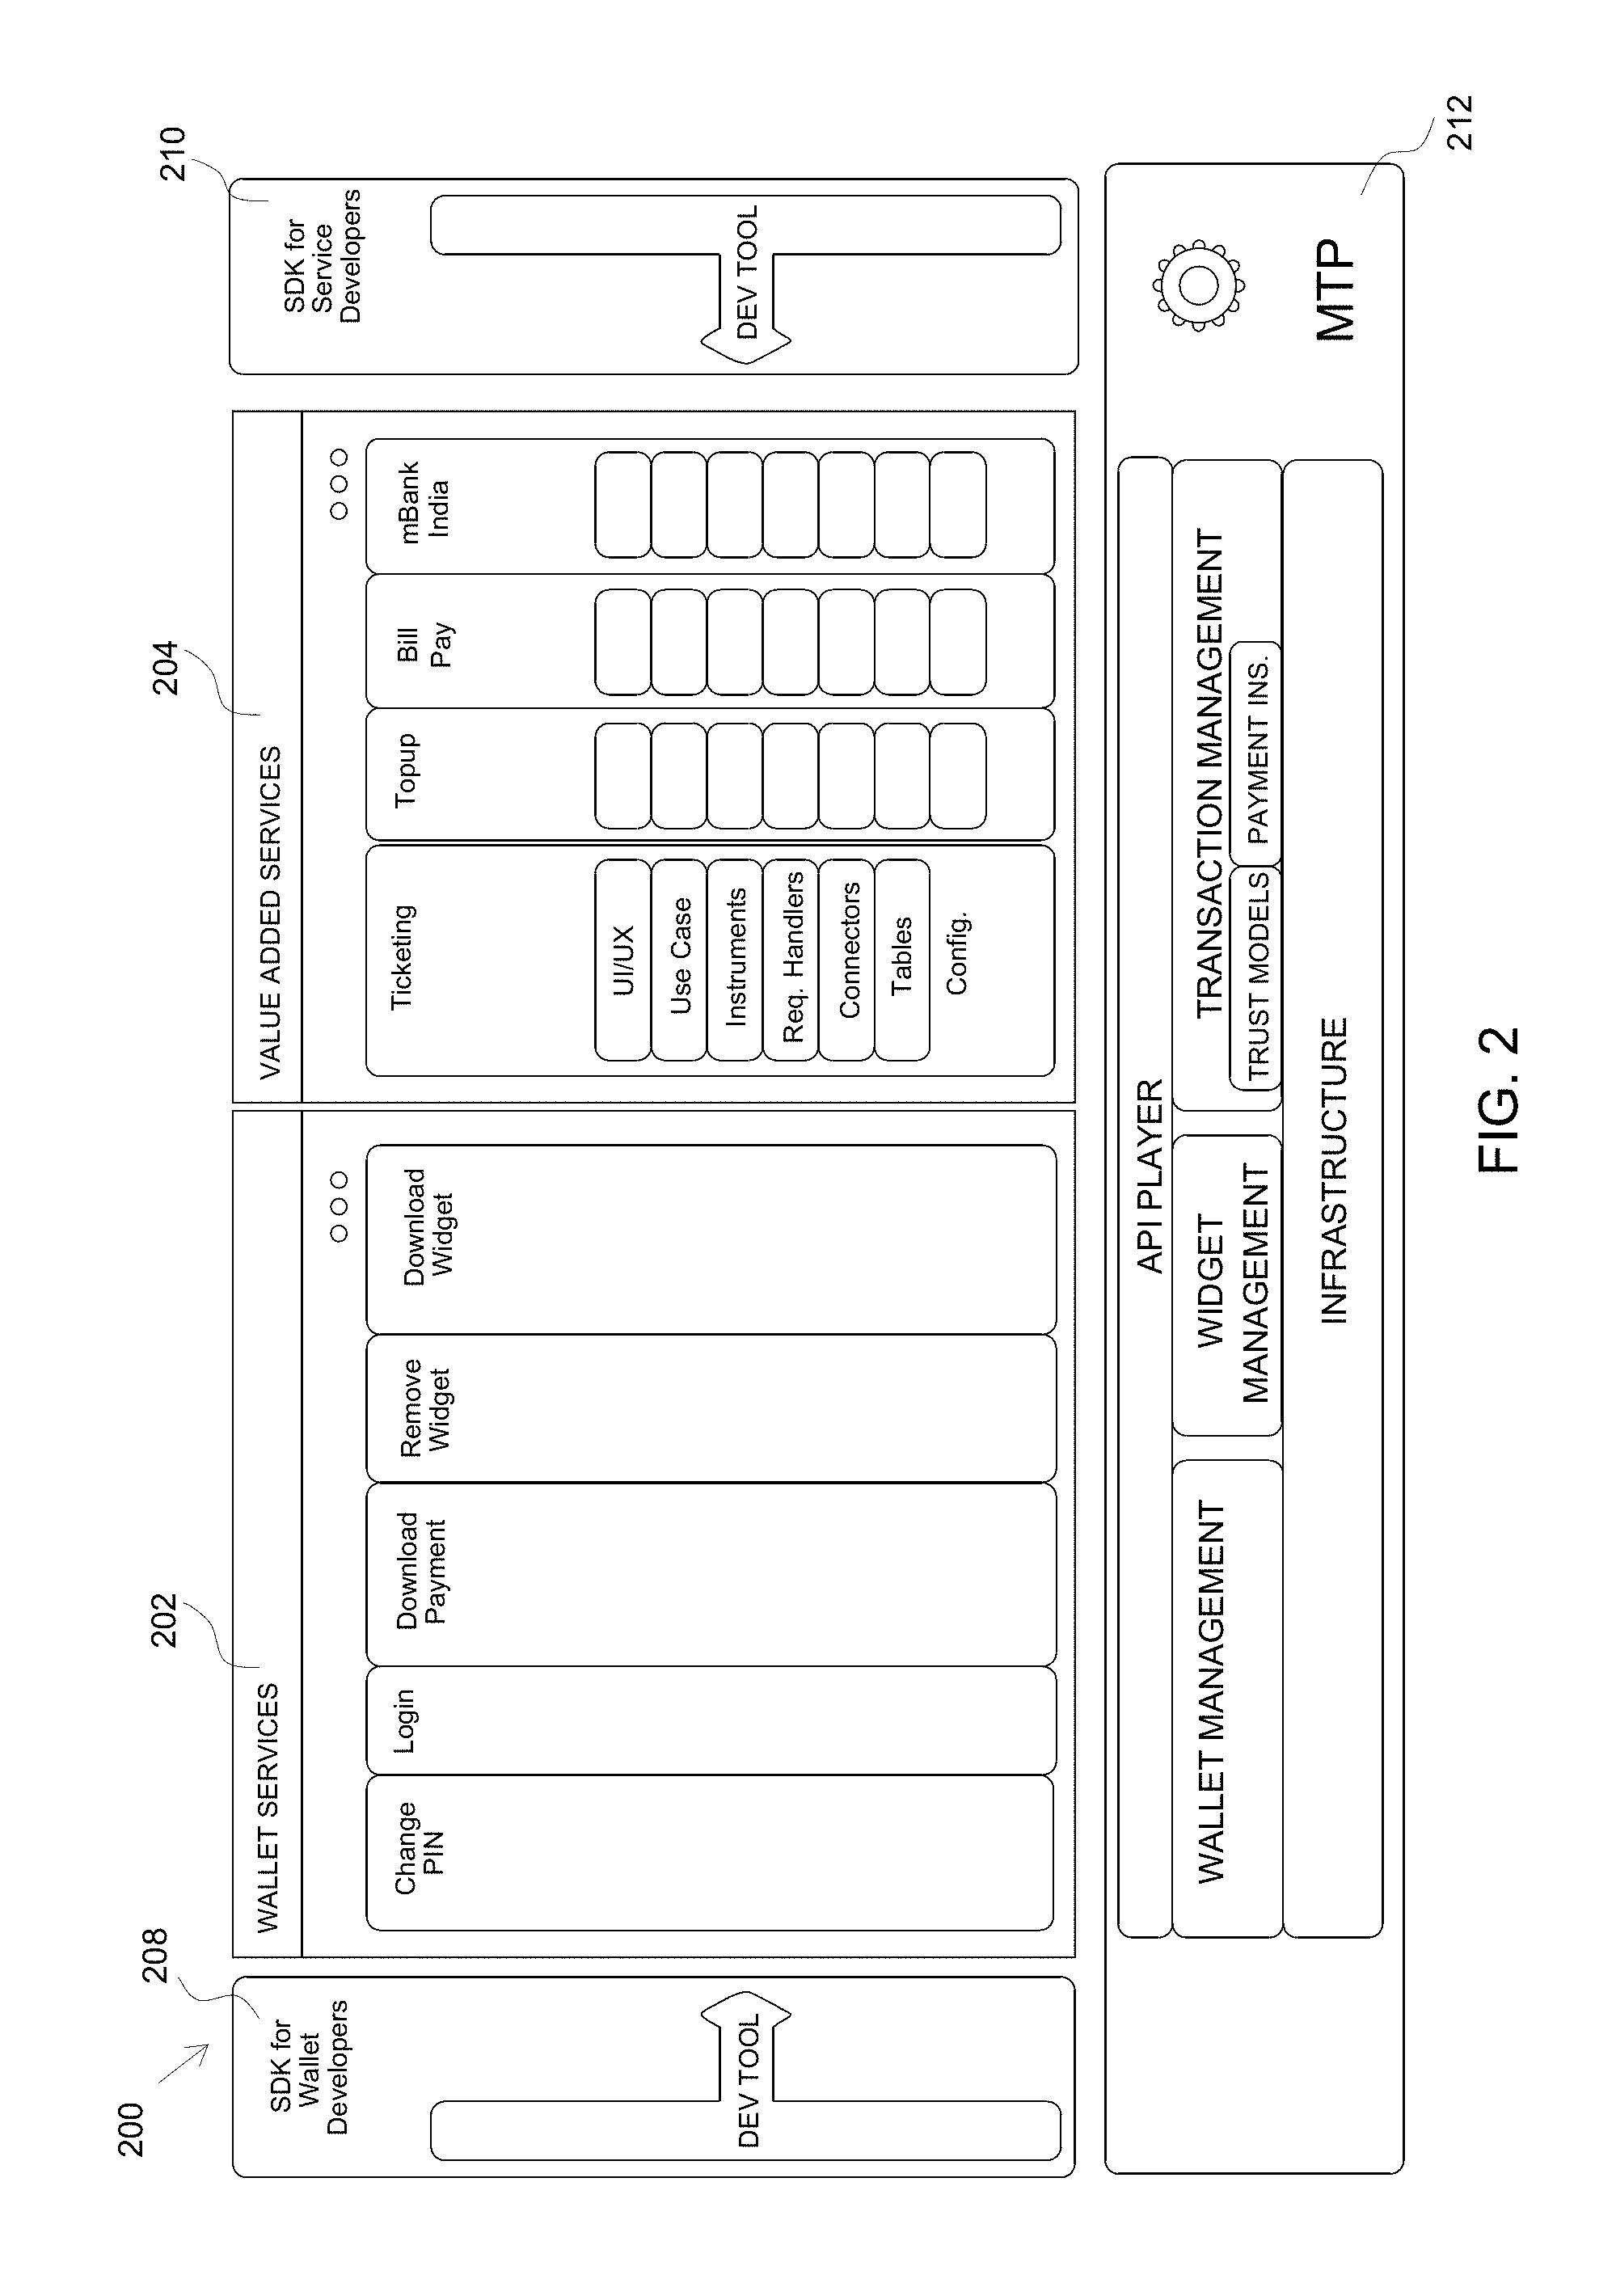 Patent US 10,032,160 B2